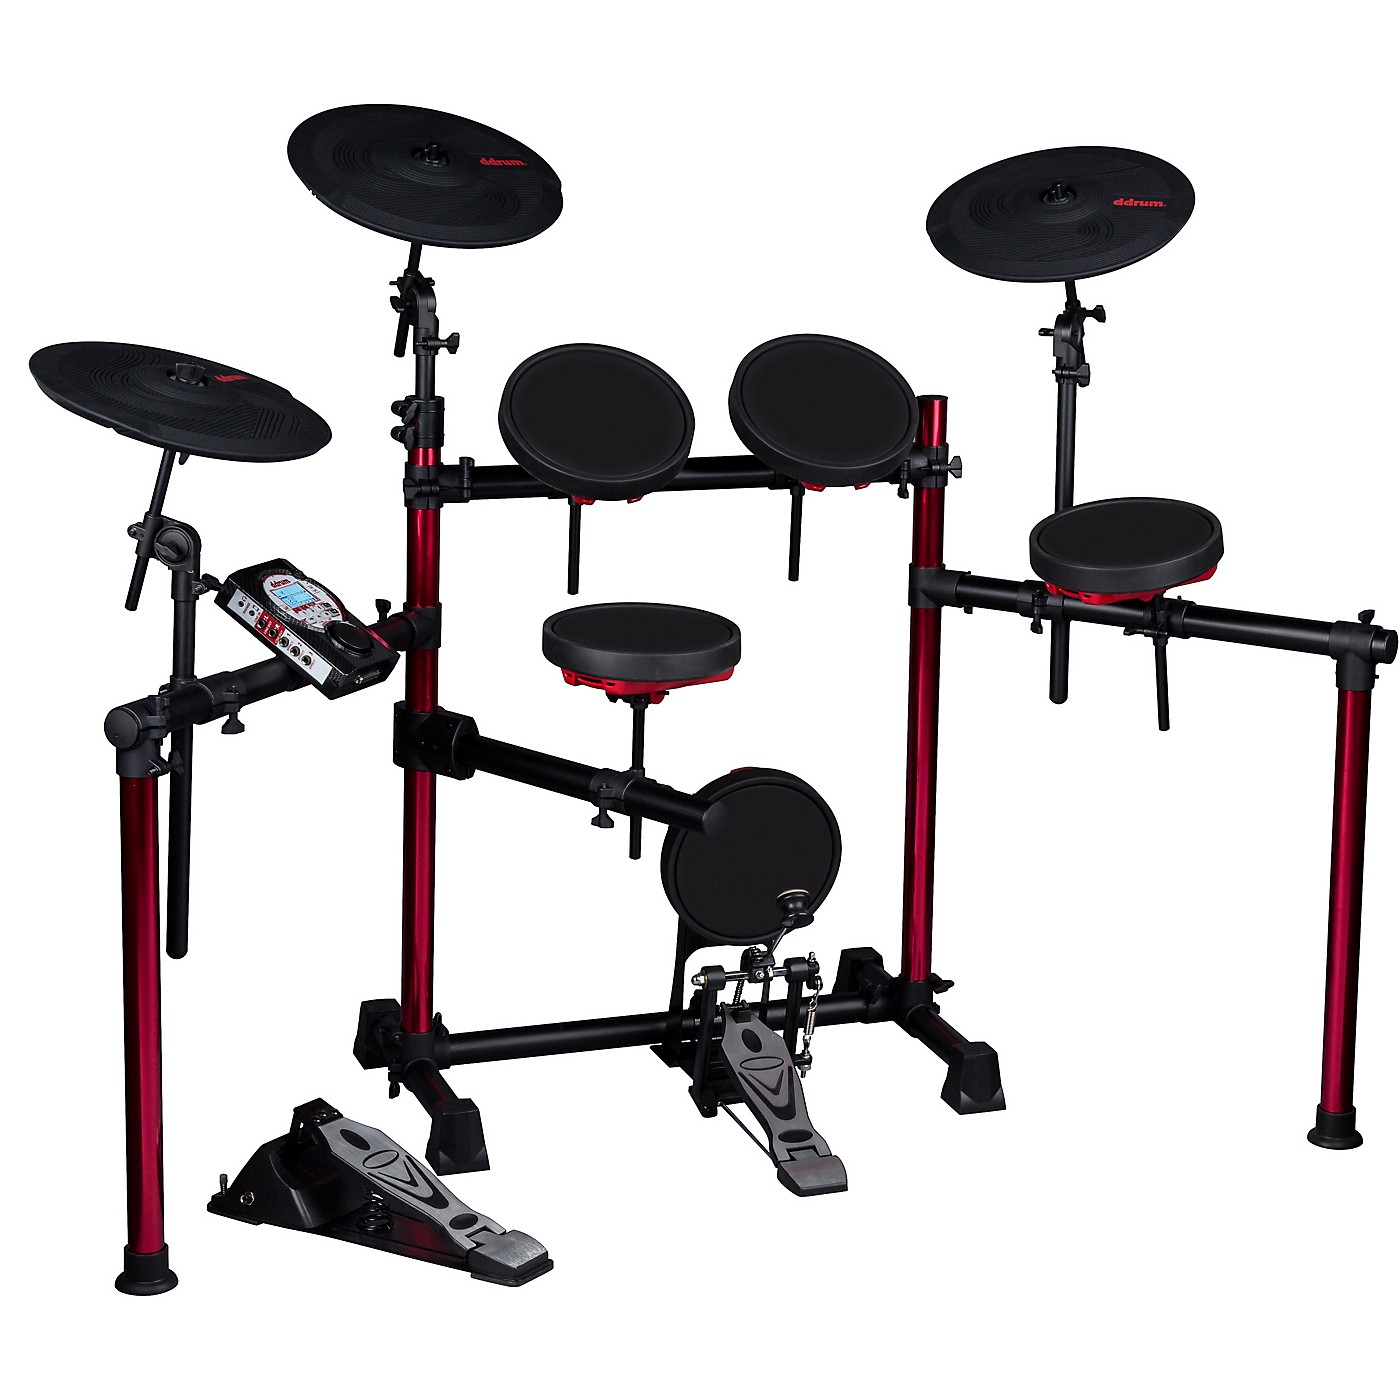 ddrum DD Beta Pro Electronic Drum Set thumbnail